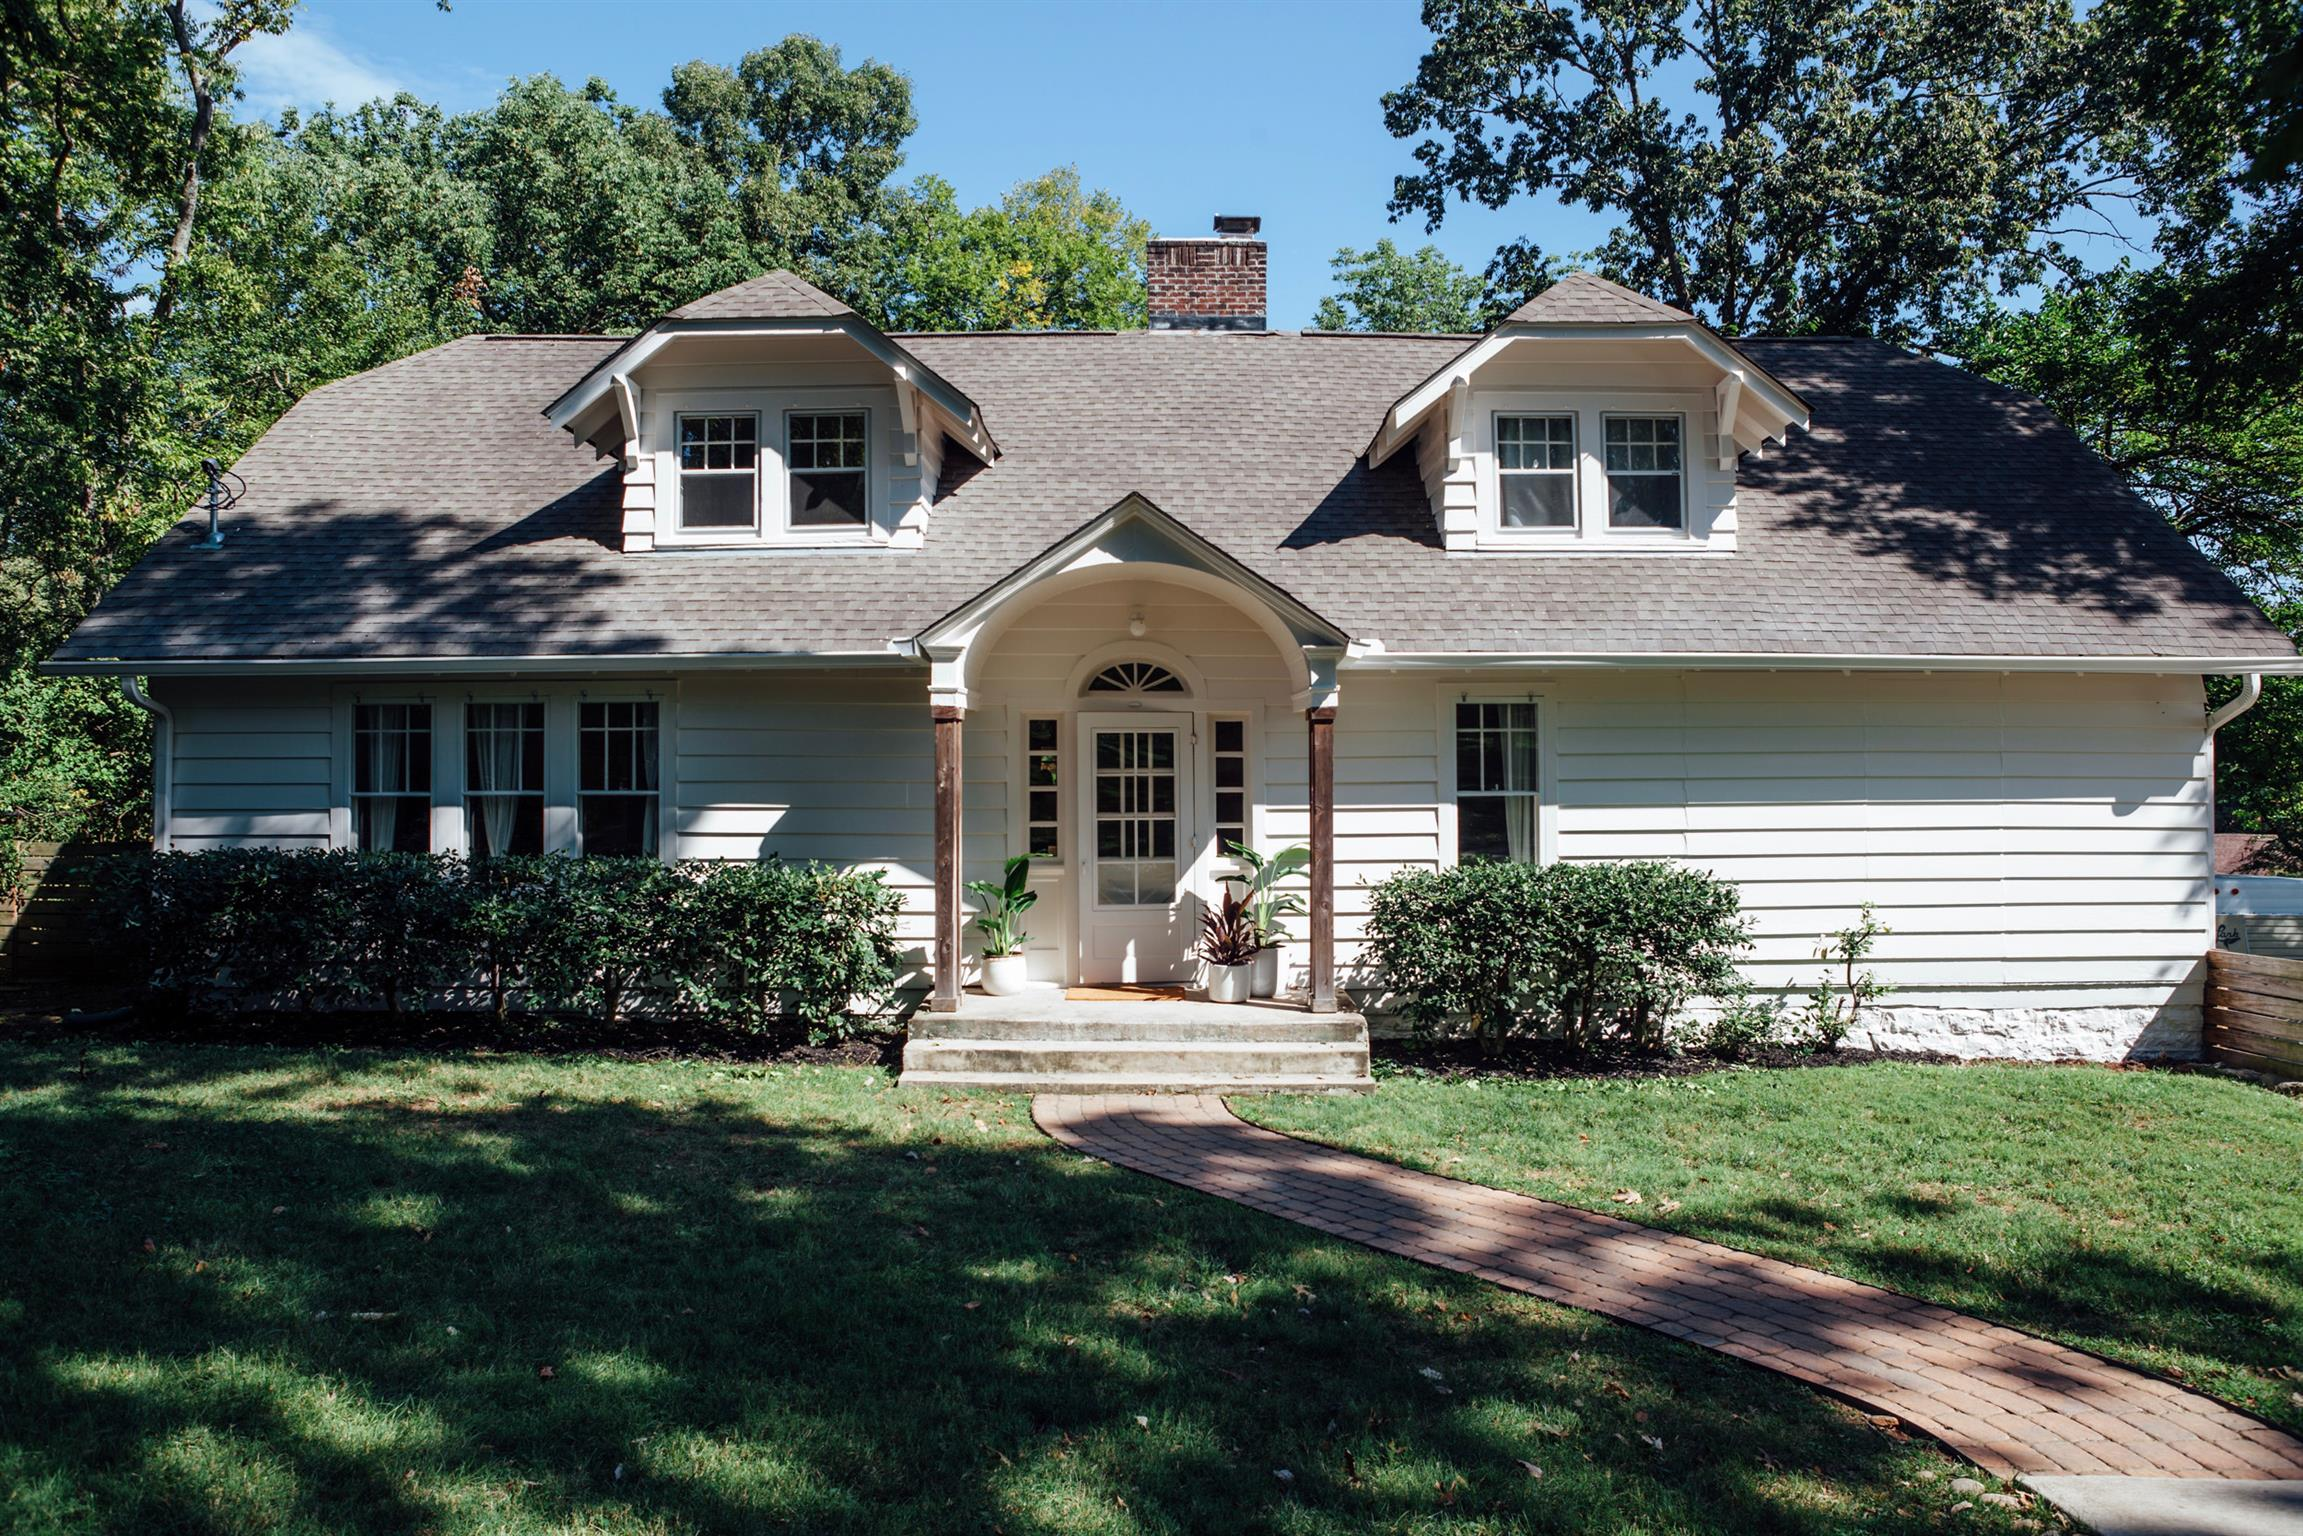 609 Maplewood Ln, Nashville, TN 37216 - Nashville, TN real estate listing